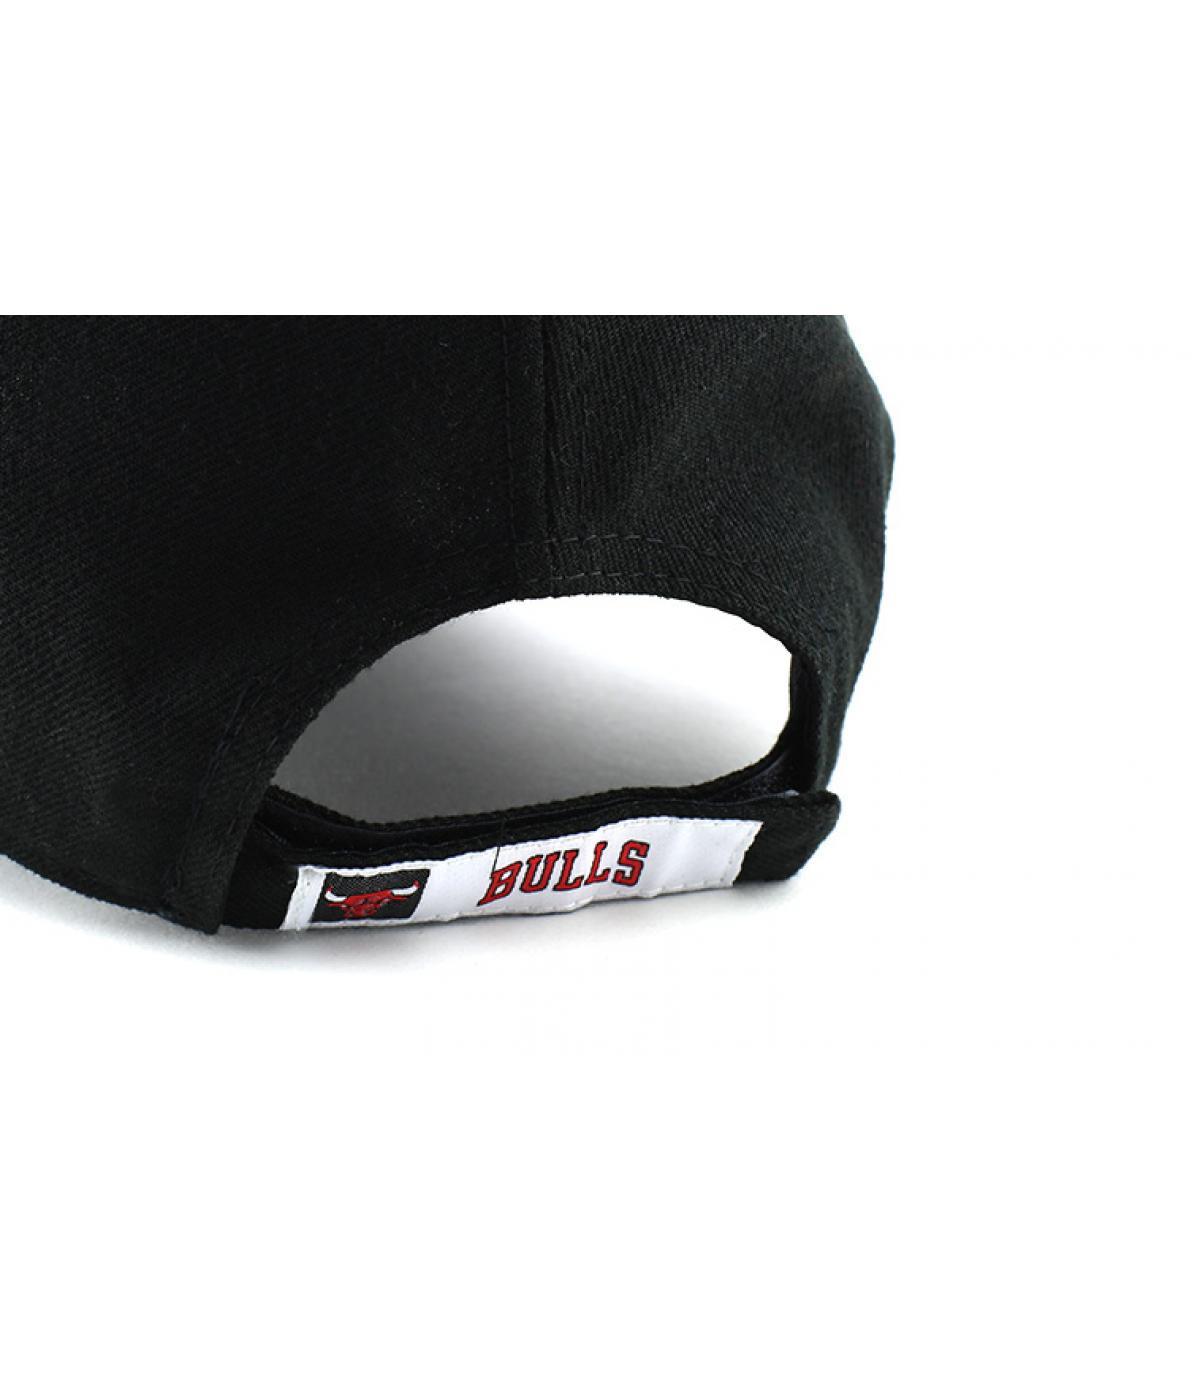 Details Cap Chicago Bulls The League Team - afbeeling 5